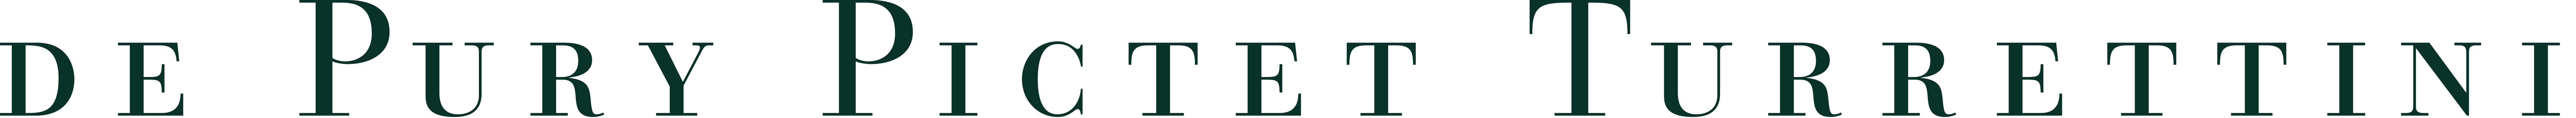 Logo de Pury Pictet Turrettini